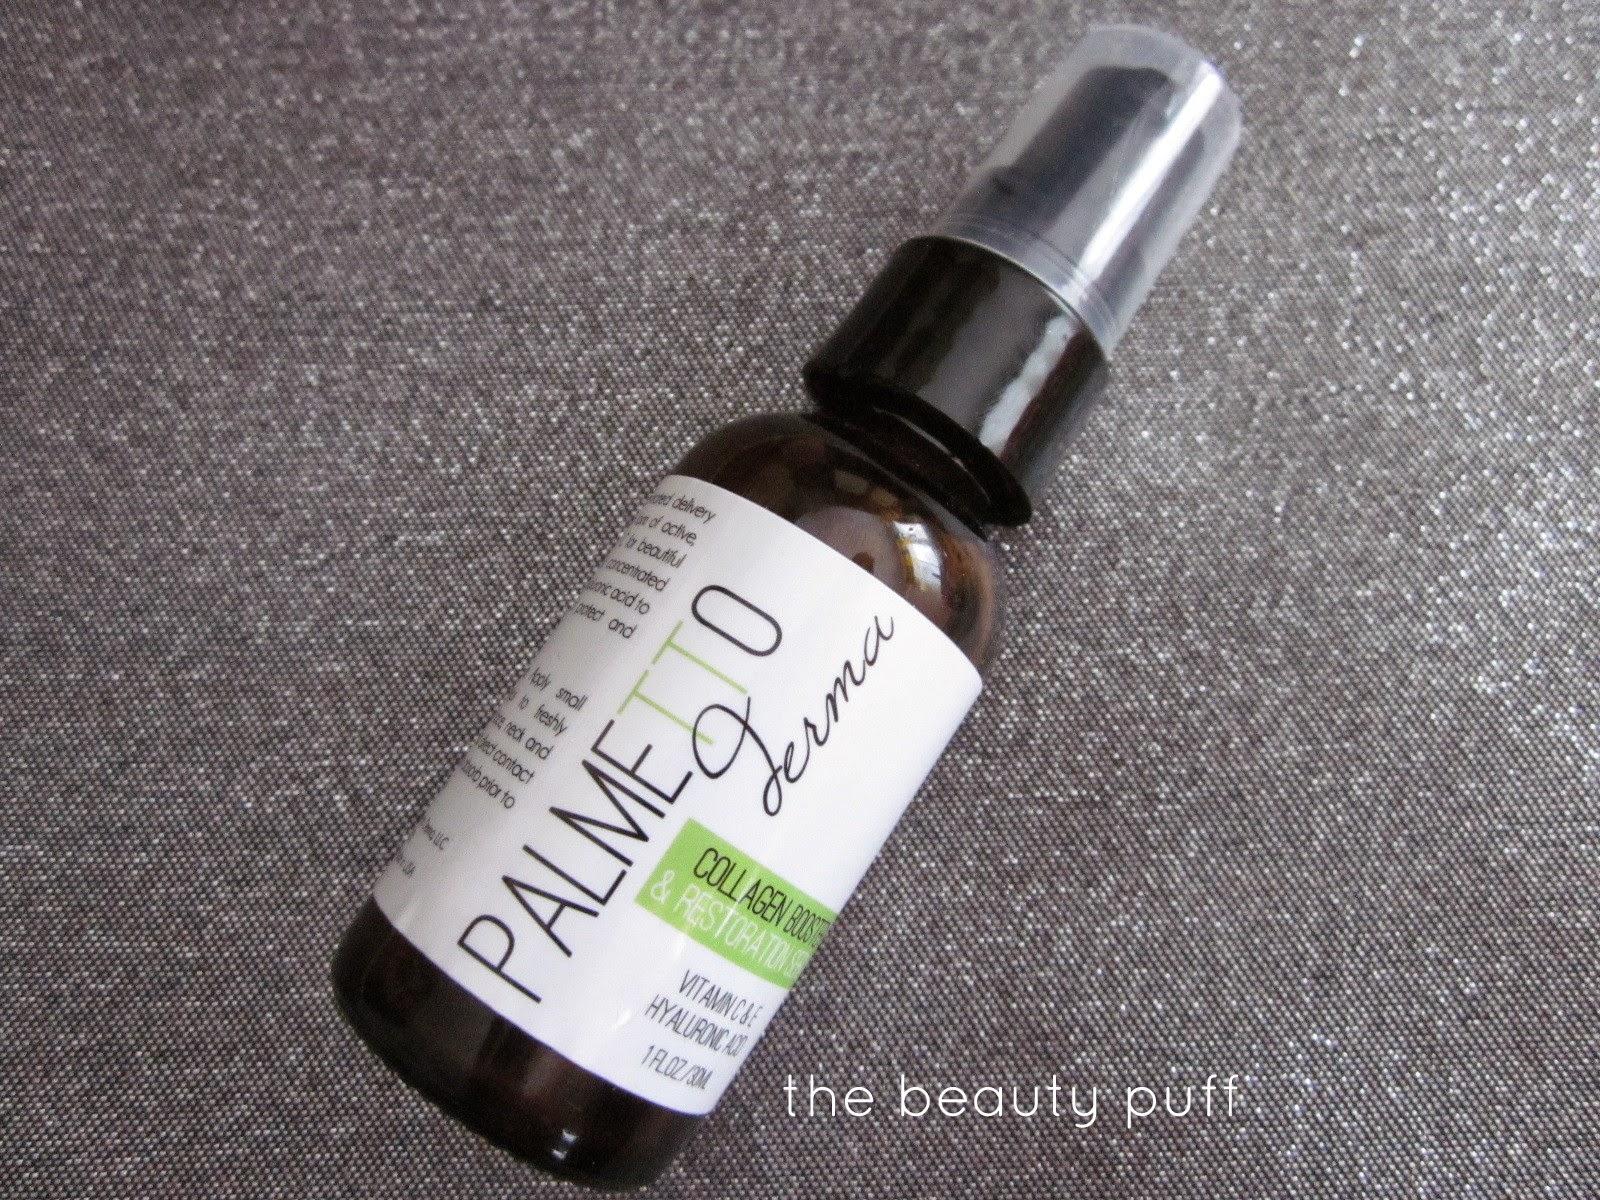 palmetto derma serum - the beauty puff